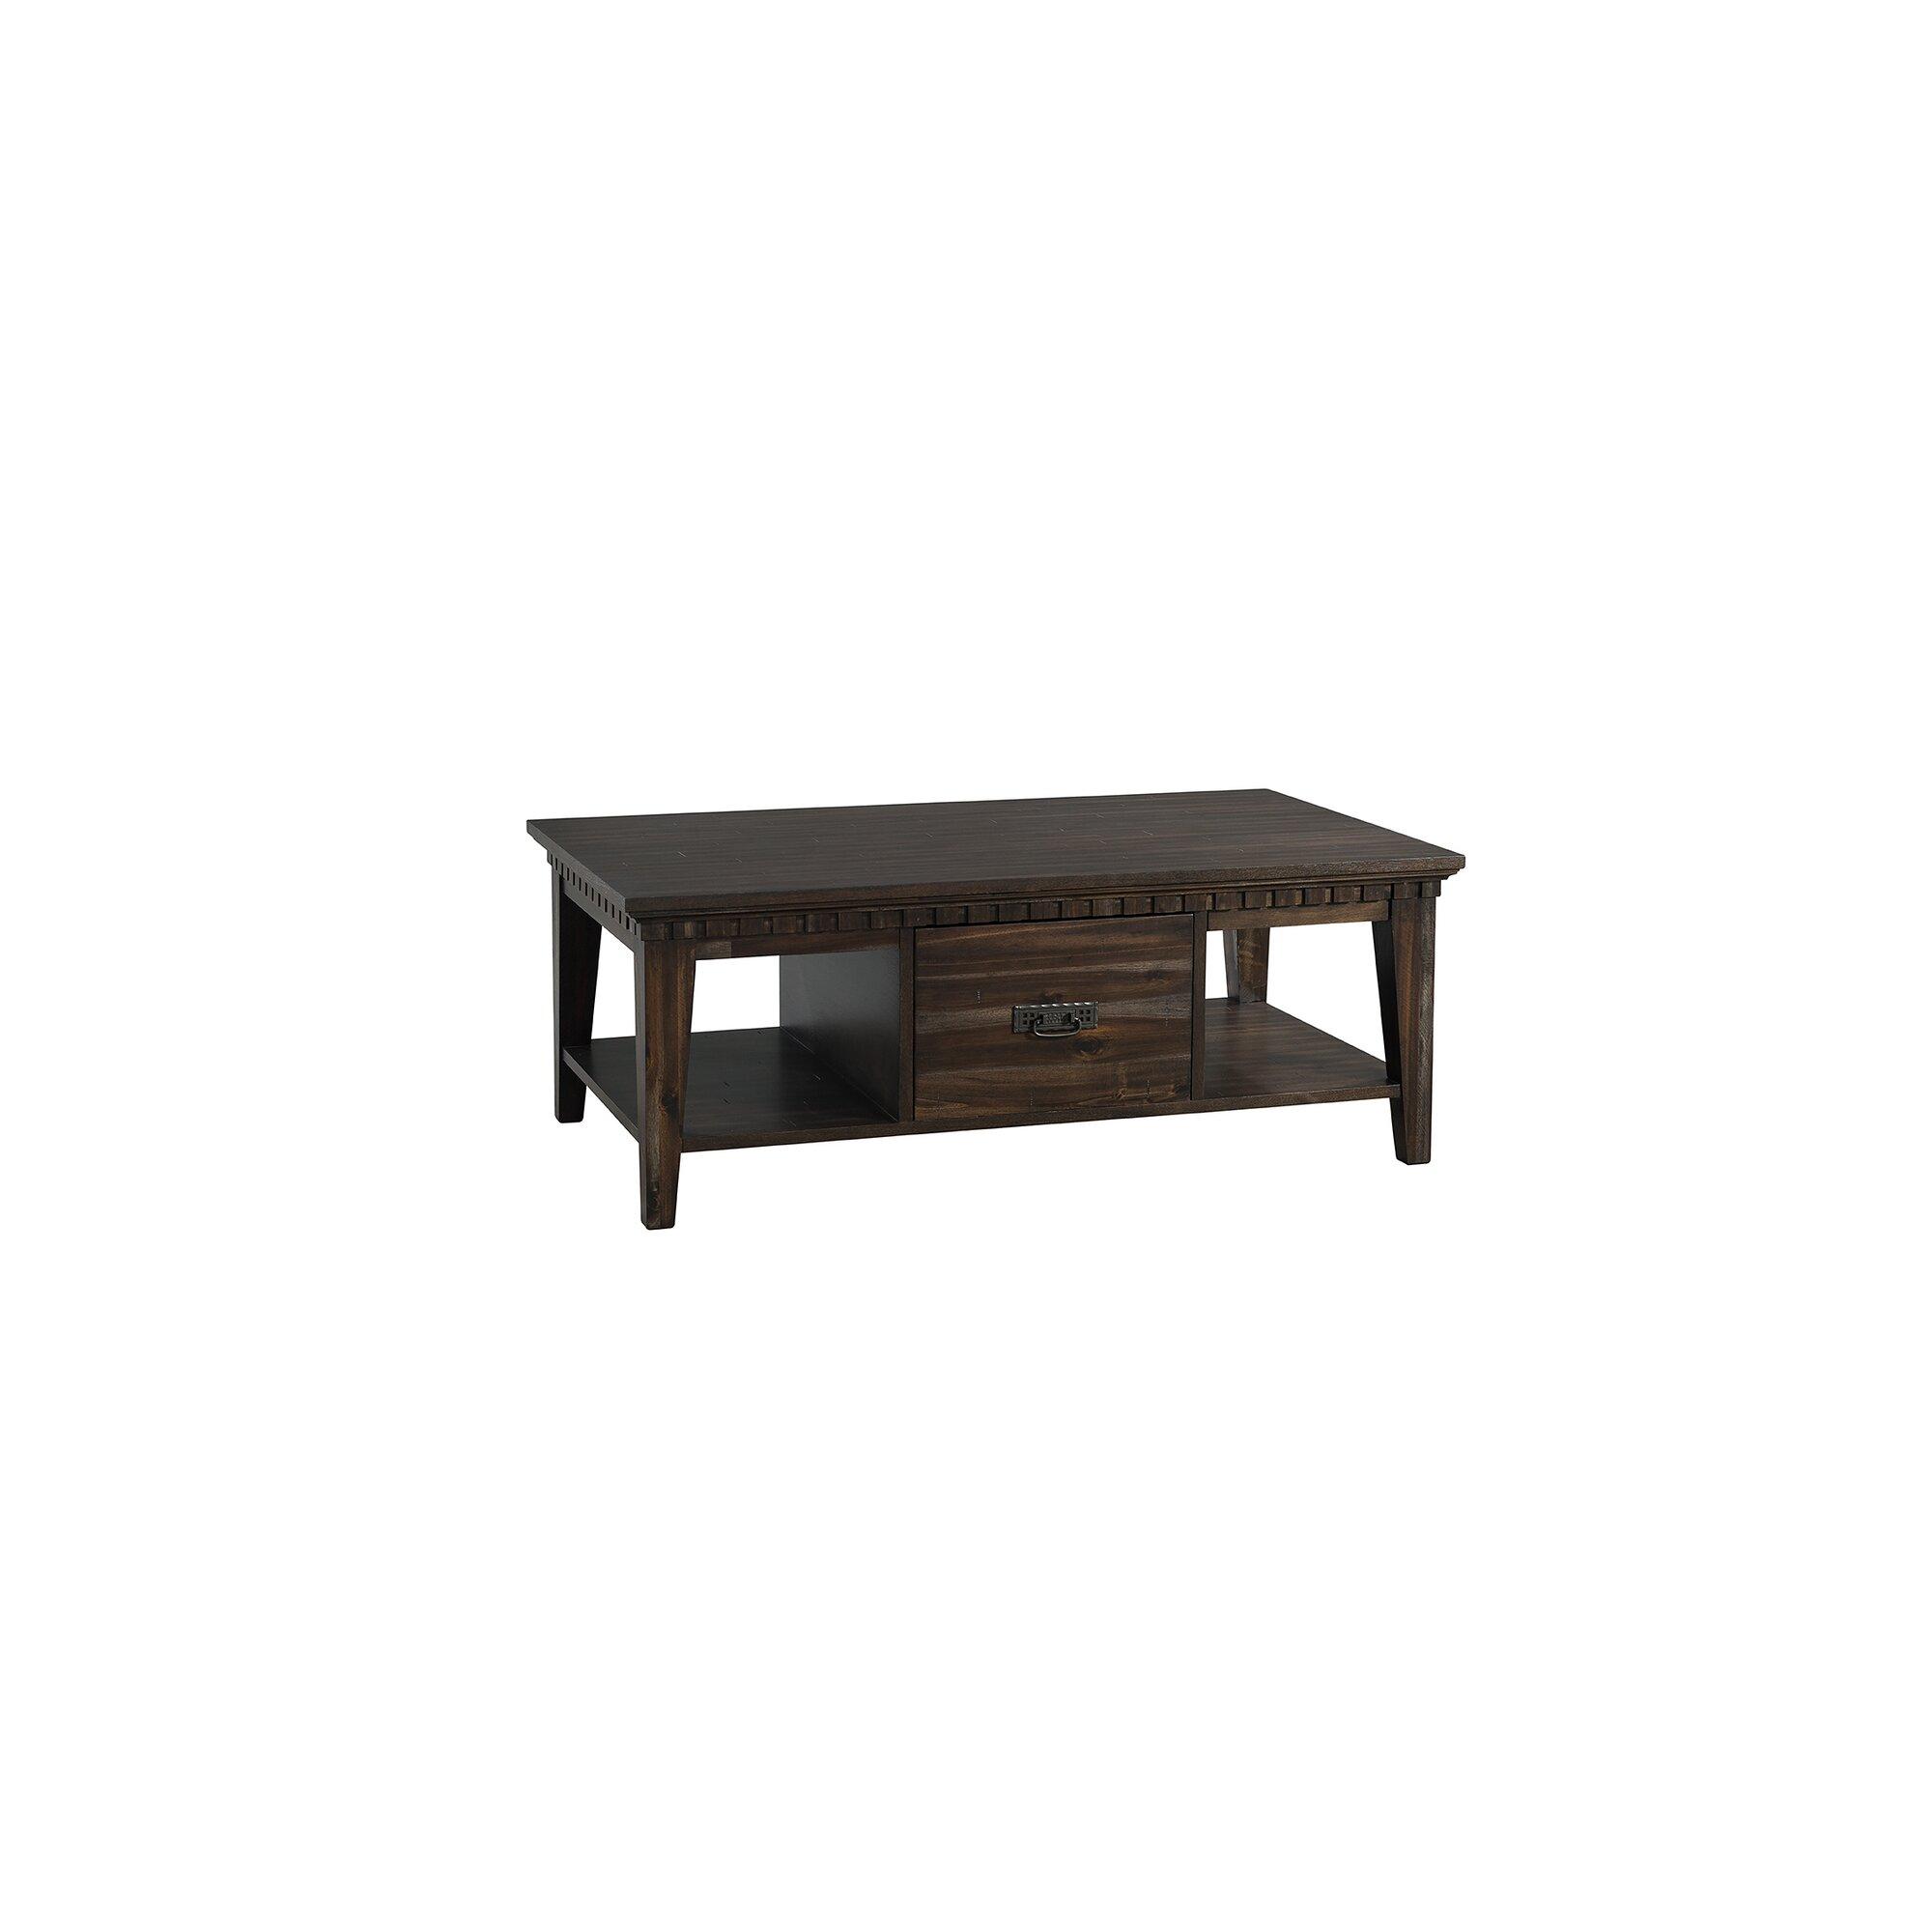 Laurel Foundry Modern Farmhouse Suzann 4 Piece Coffee Table Set